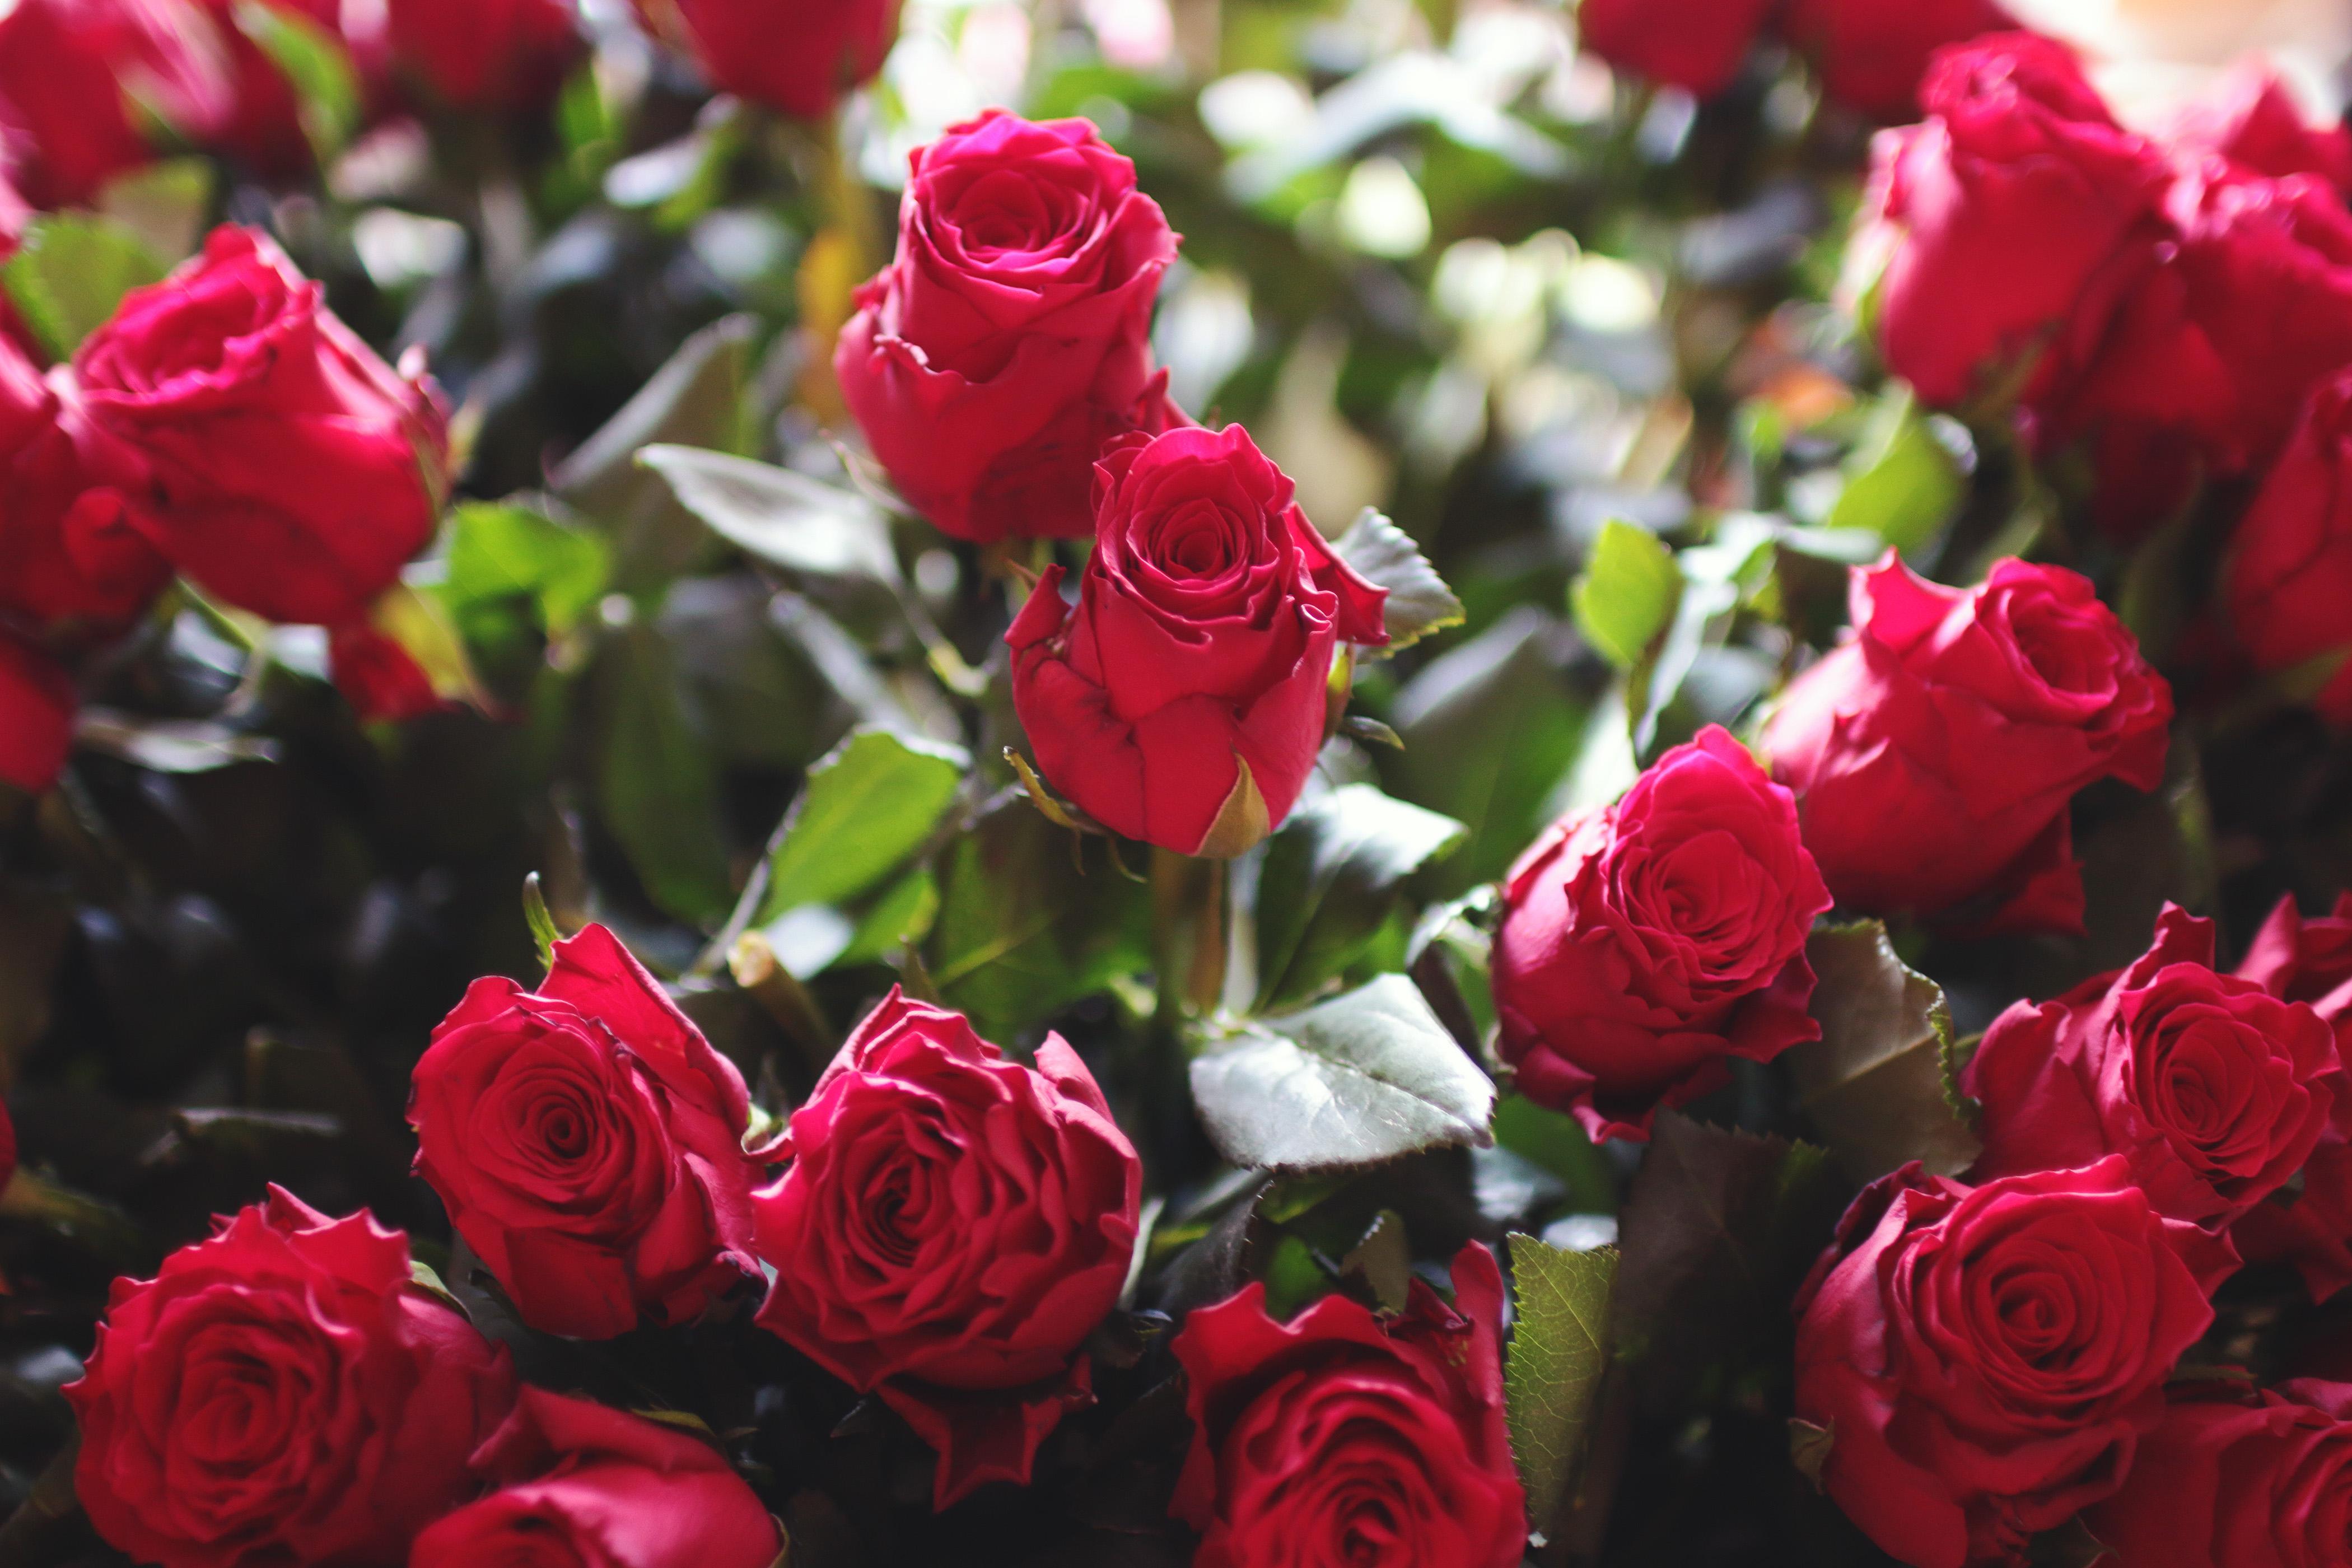 Flowers download acurnamedia flowers download izmirmasajfo